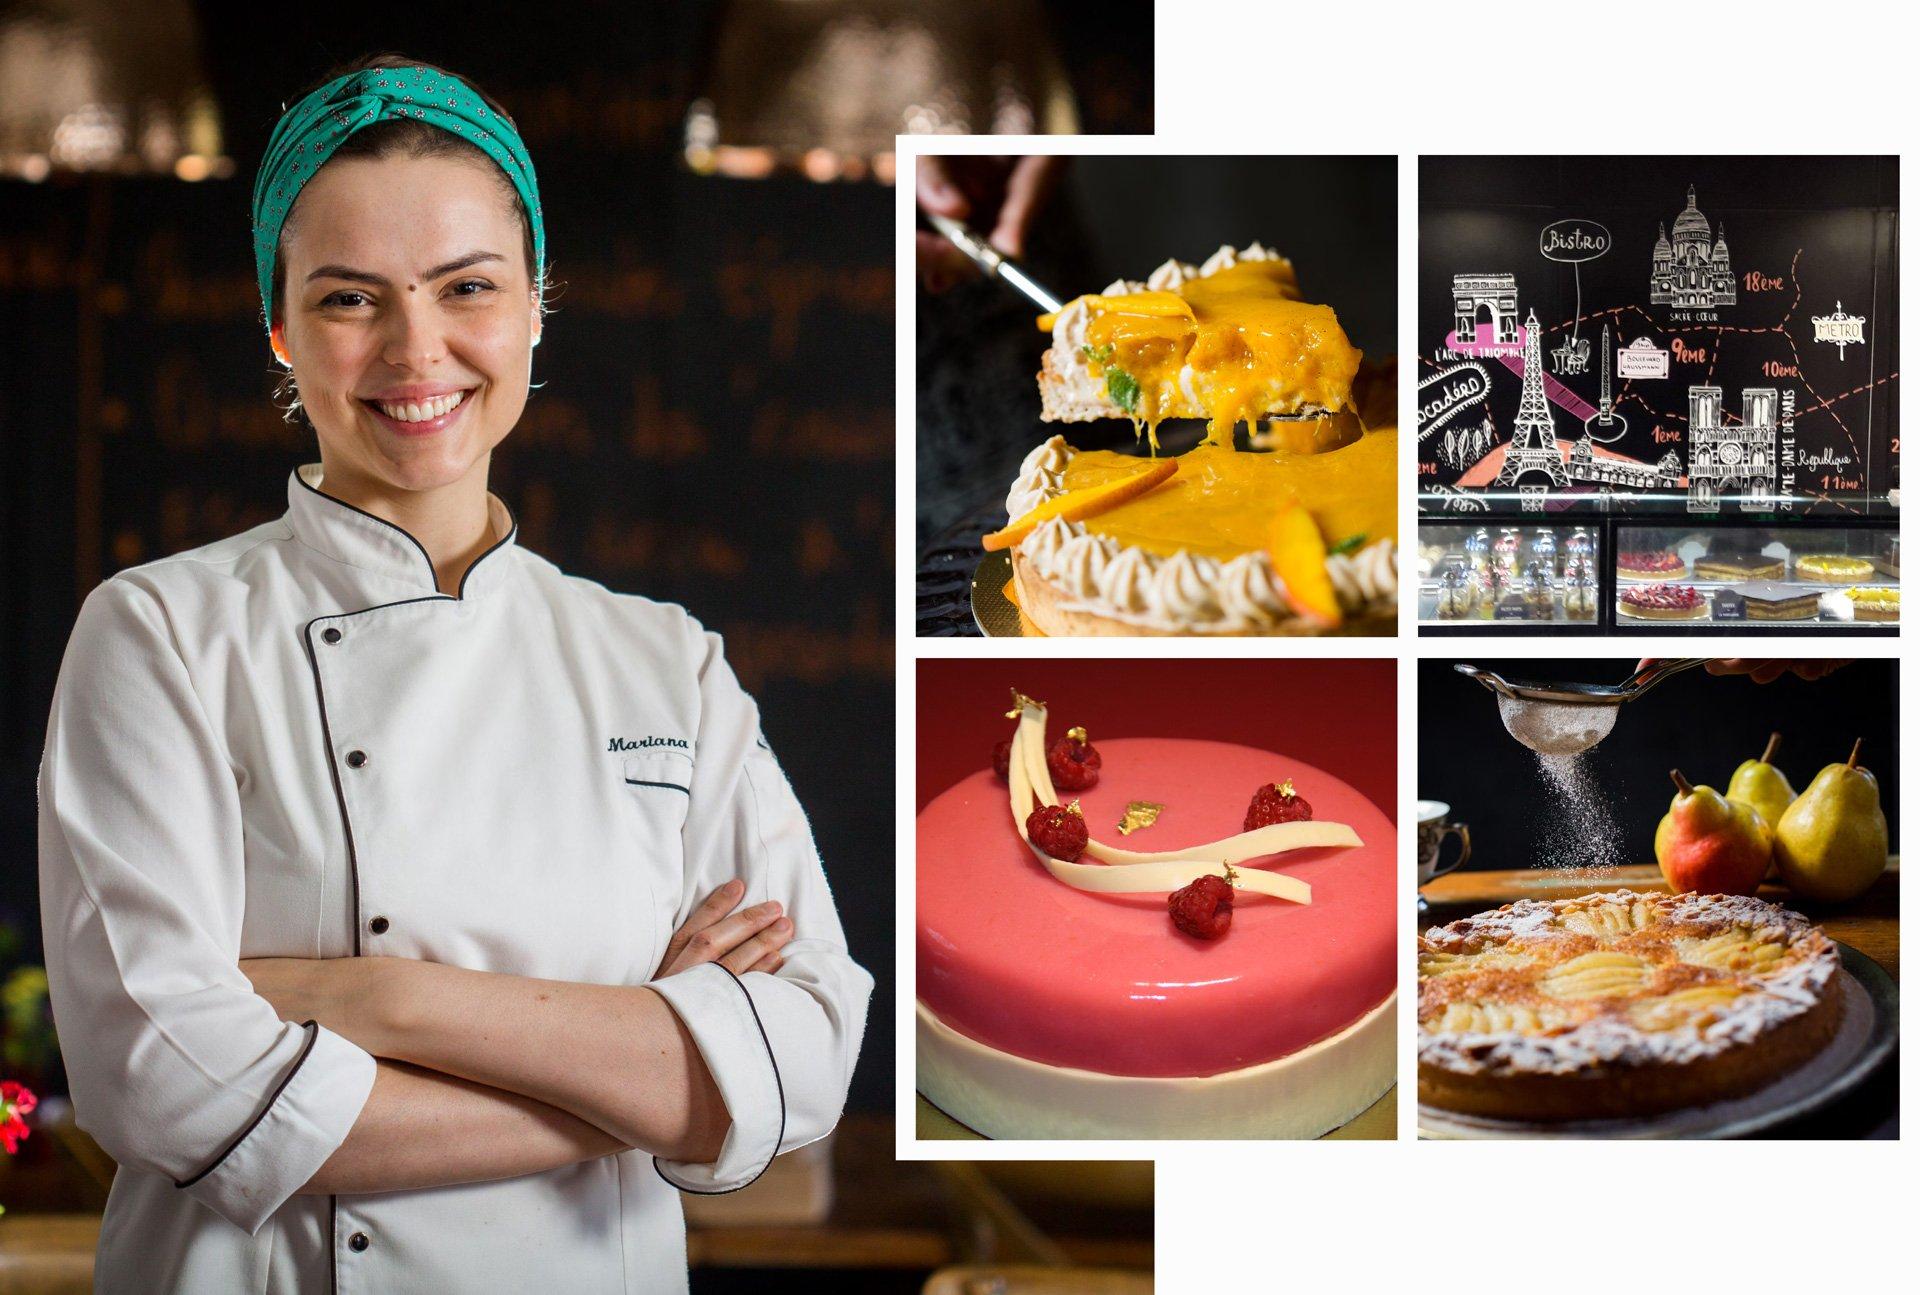 Marina Correa da Cunha, diplôme de cuisine 2013